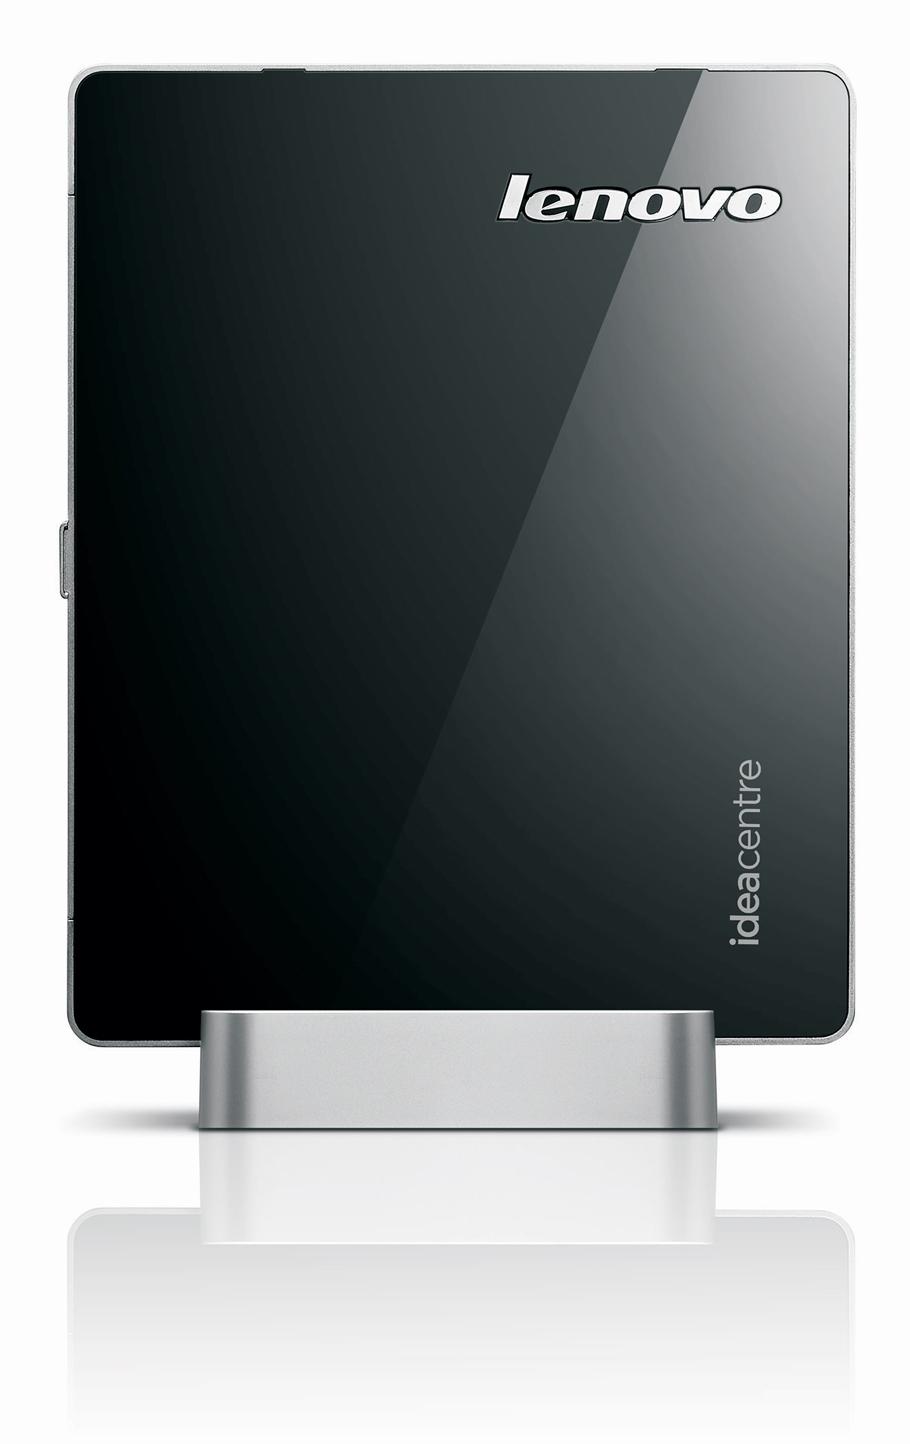 Lenovo-IdeaCentre_002